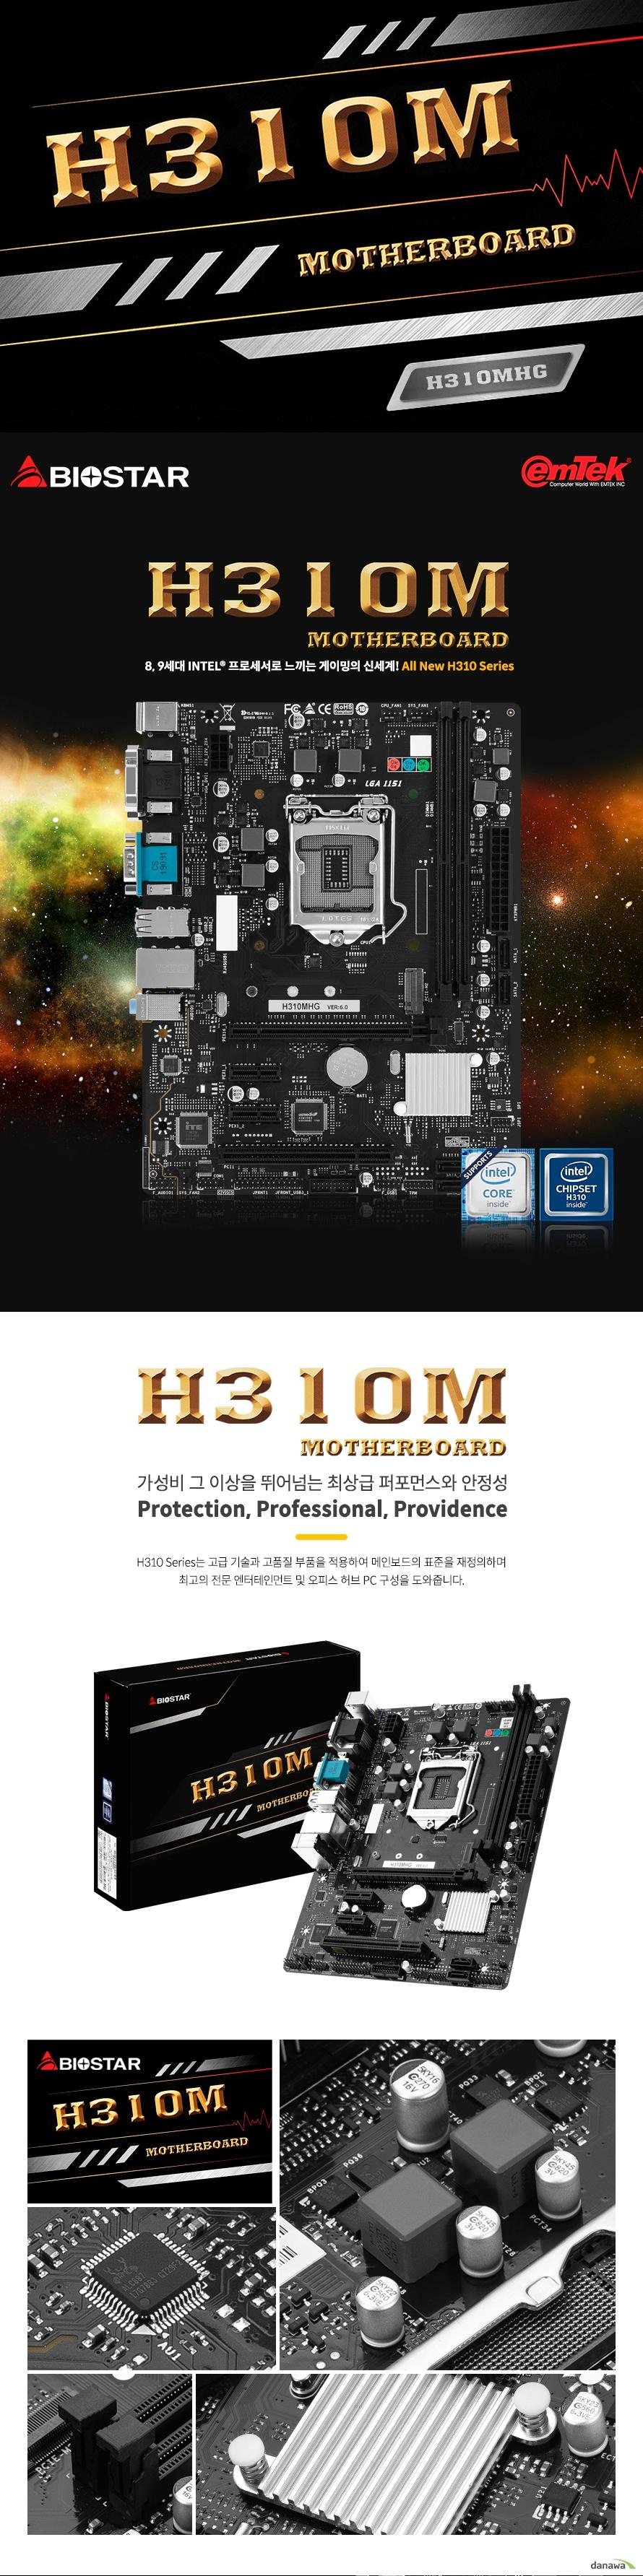 BIOSTAR H310MHG LGA1151소켓 Cpu 9세대 및 8세대 인텔 코어 i7 i5 i3 및 펜티엄, 셀러론 프로세서 지원 최대 CPU TDP 95와트 지원  인텔 h310 칩셋 지원  Ddr4 dimm 최대 32gb 지원 듀얼 채널 ddr4 2666 2400 2133 1866 mhz 지원  Pcie 3.0 x16 1개 지원 Pcie 2.0 x1 2개 지원 PCI 1개 지원  Sata3 소켓 4개 지원 2242 2260 2280 10gb m.2 소켓 1개 지원  Usb 3,1 gen1 4개 지원 Usb 2.0 6개 지원  리얼텍 alc 887 7.1채널hd 오디오 코덱 지원 리얼텍 RTL8111H 기가비트 랜 지원  윈도우10 64비트 지원  마이크로 atx 폼팩터 길이 244밀리미터 넓이 188밀리미터  kc인증  R REI EMT BS H310MHG 제조사의 사정에 따라 사전고지 없이 일부 제품사양이 변경될 수 있습니다. 구매 전 사용하시는 부품과 cpu 프로세서 등 장착 지원 여부를 확인하시기 바랍니다.